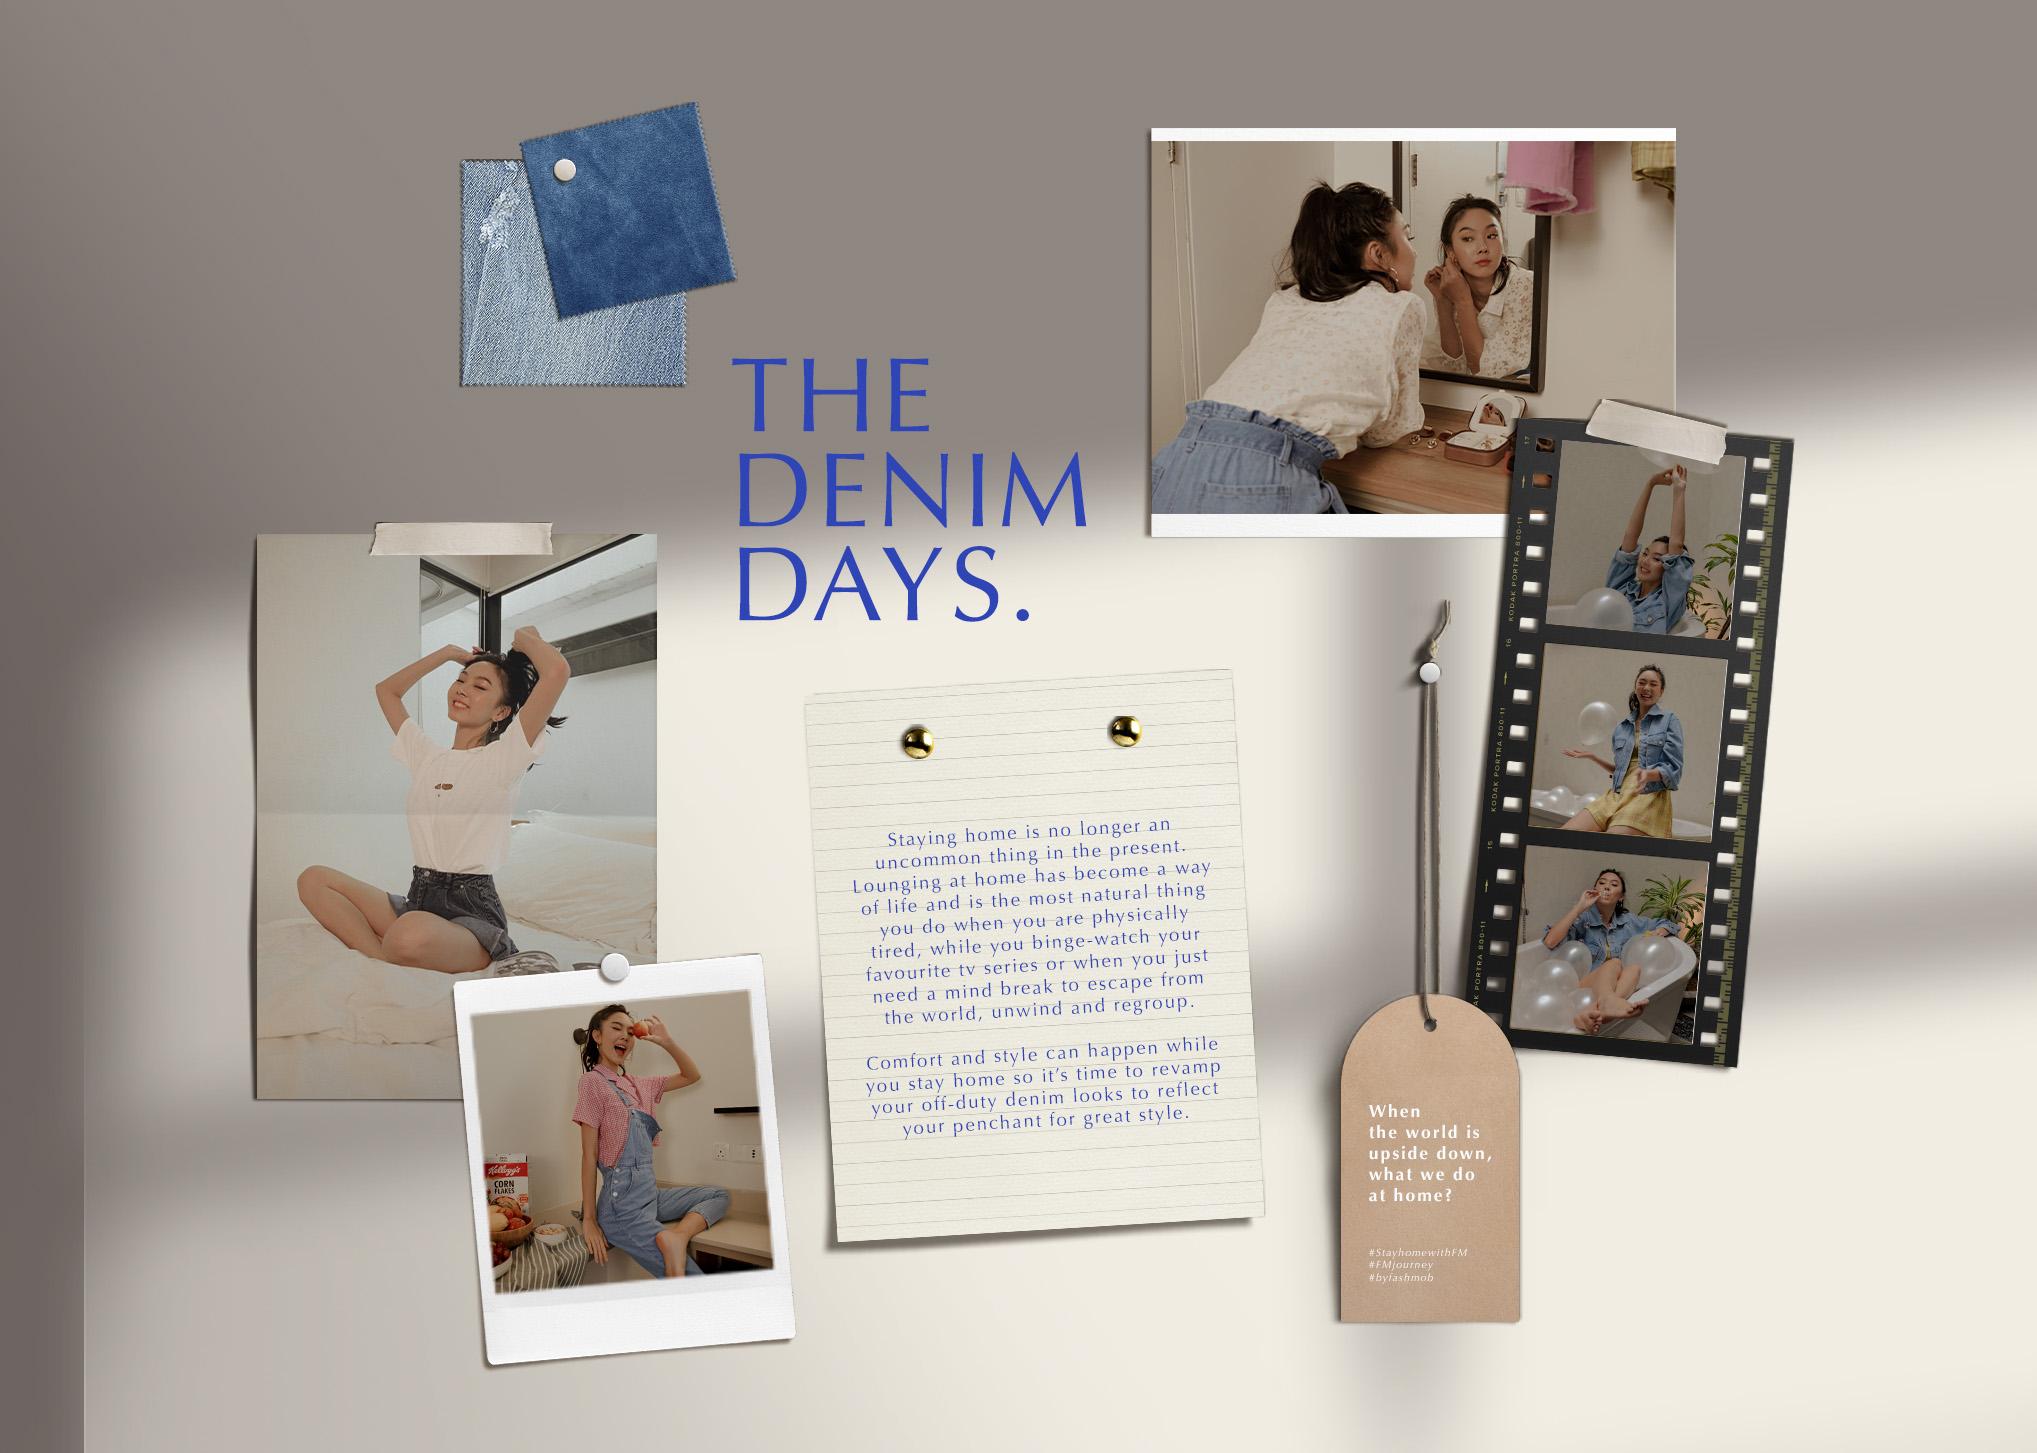 THE DENIM DAYS